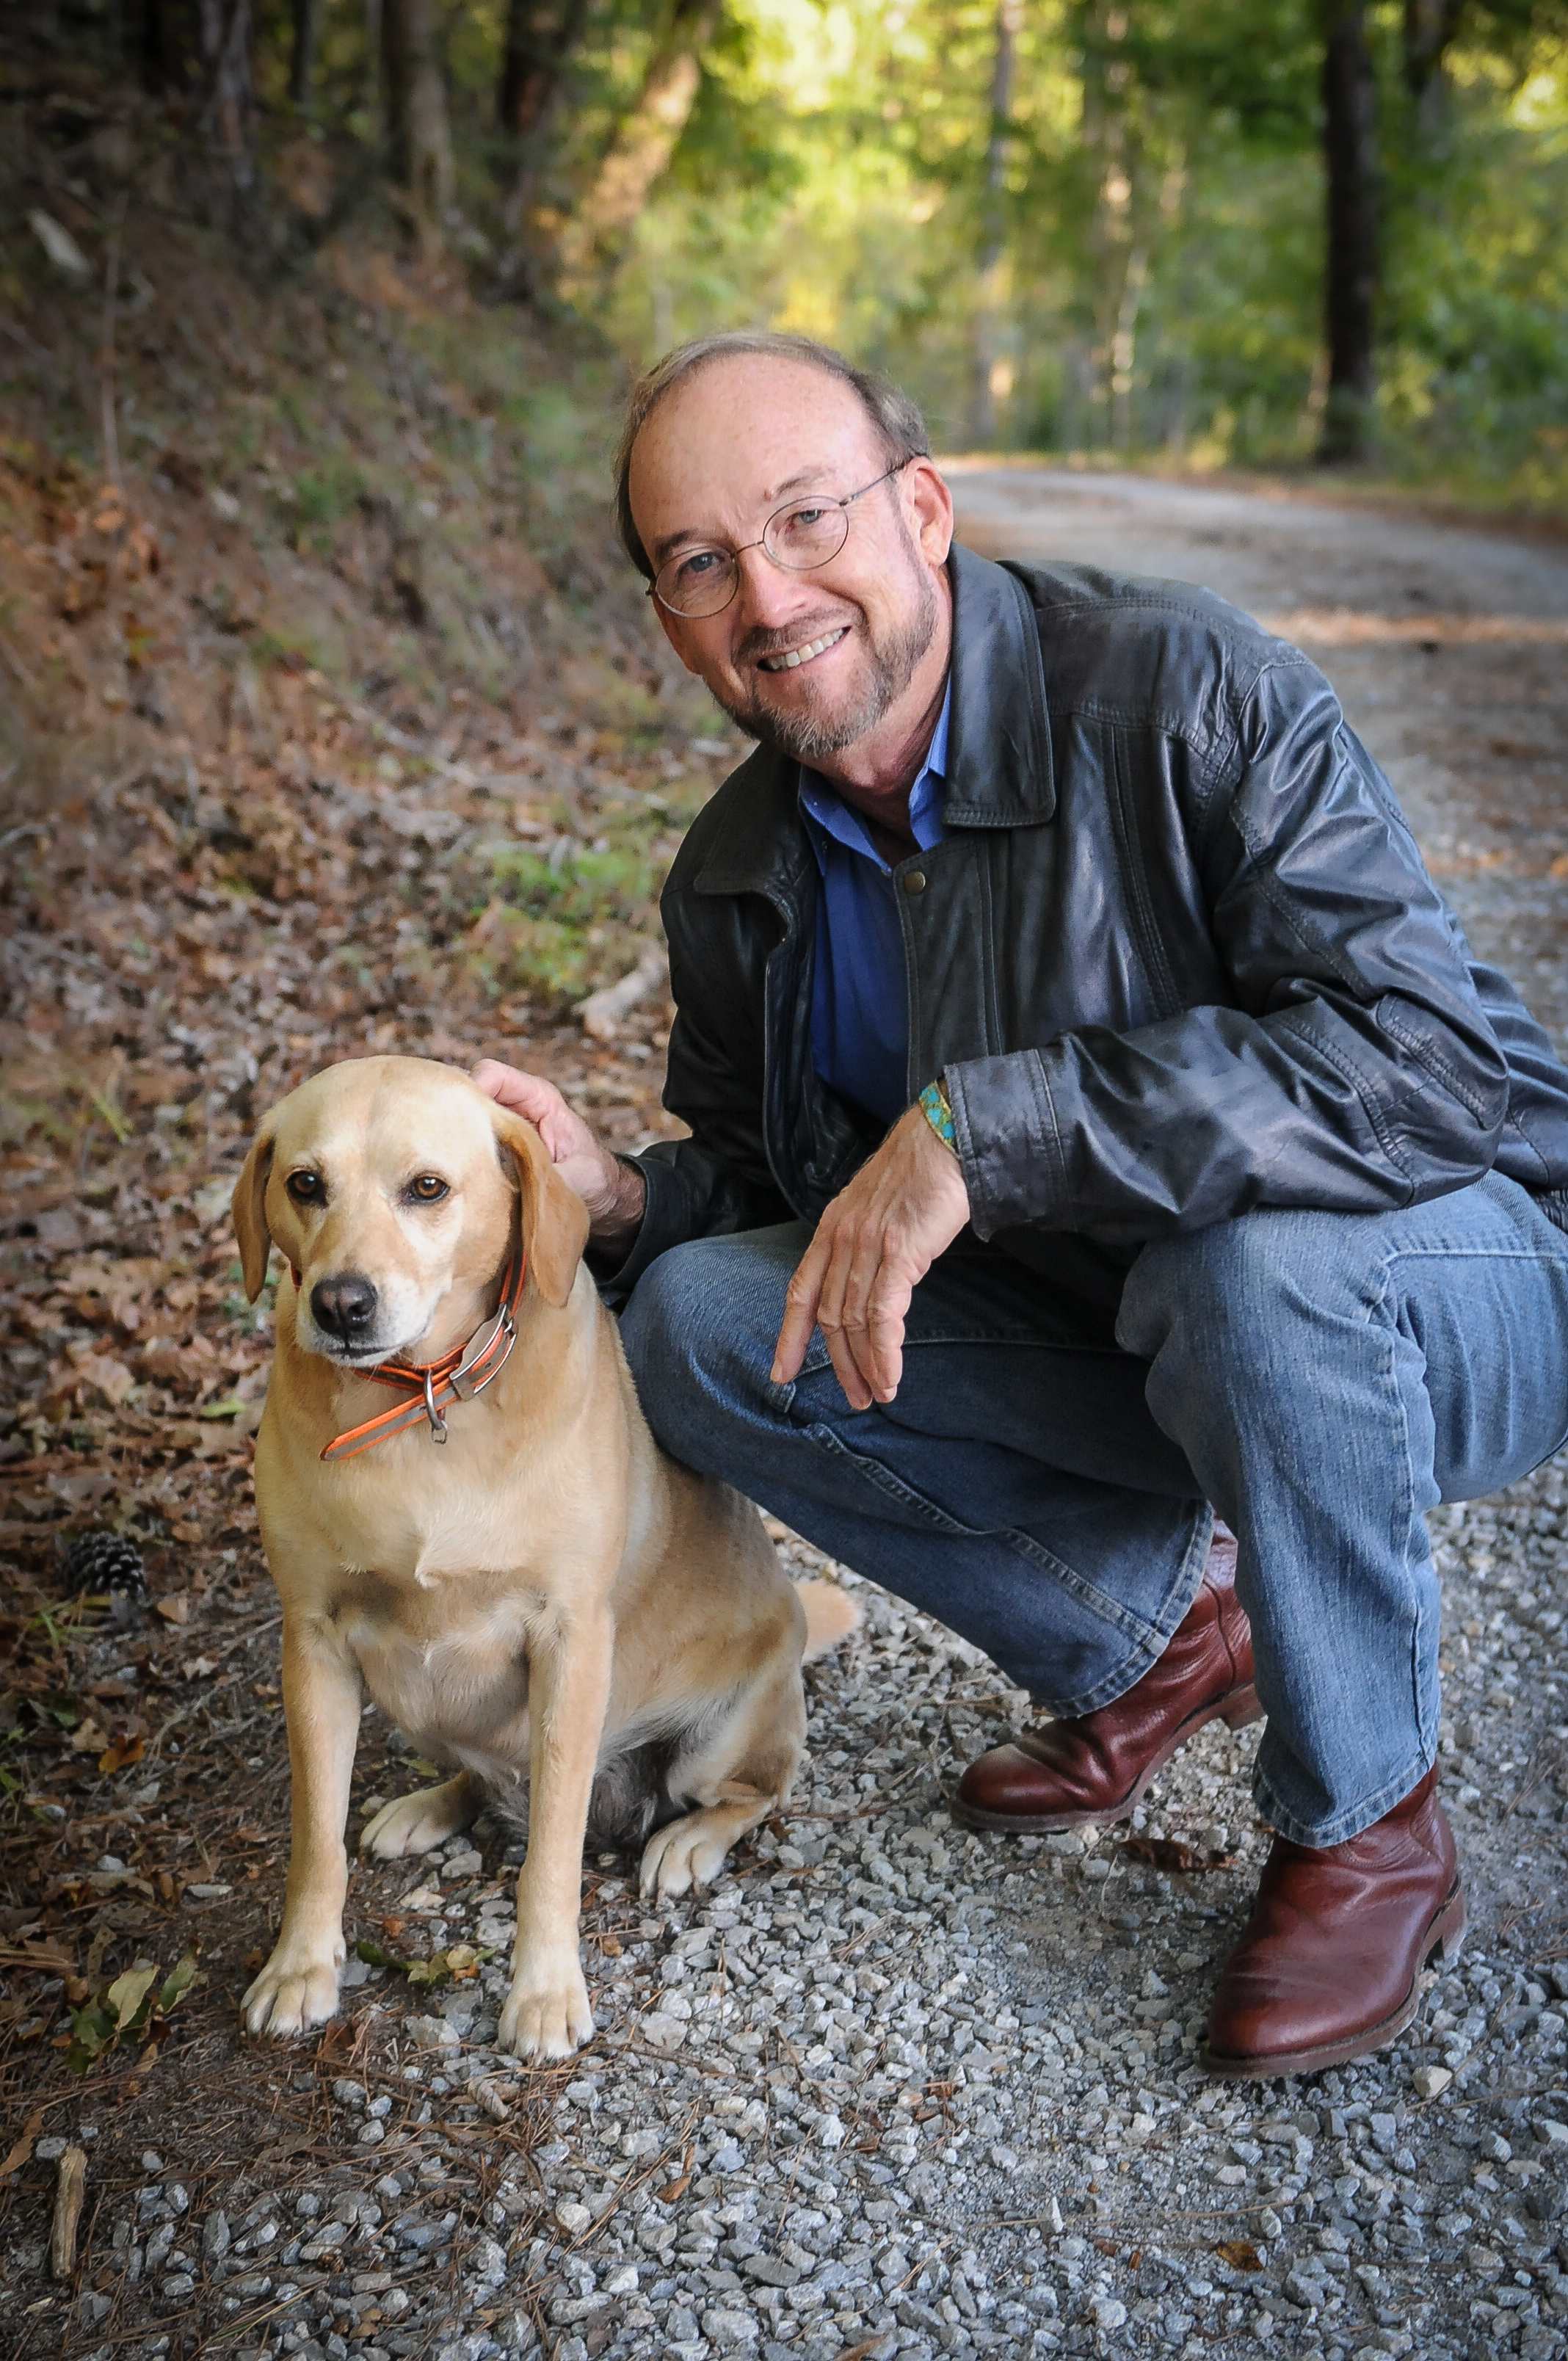 JAMES REDFIELD: MY STORY